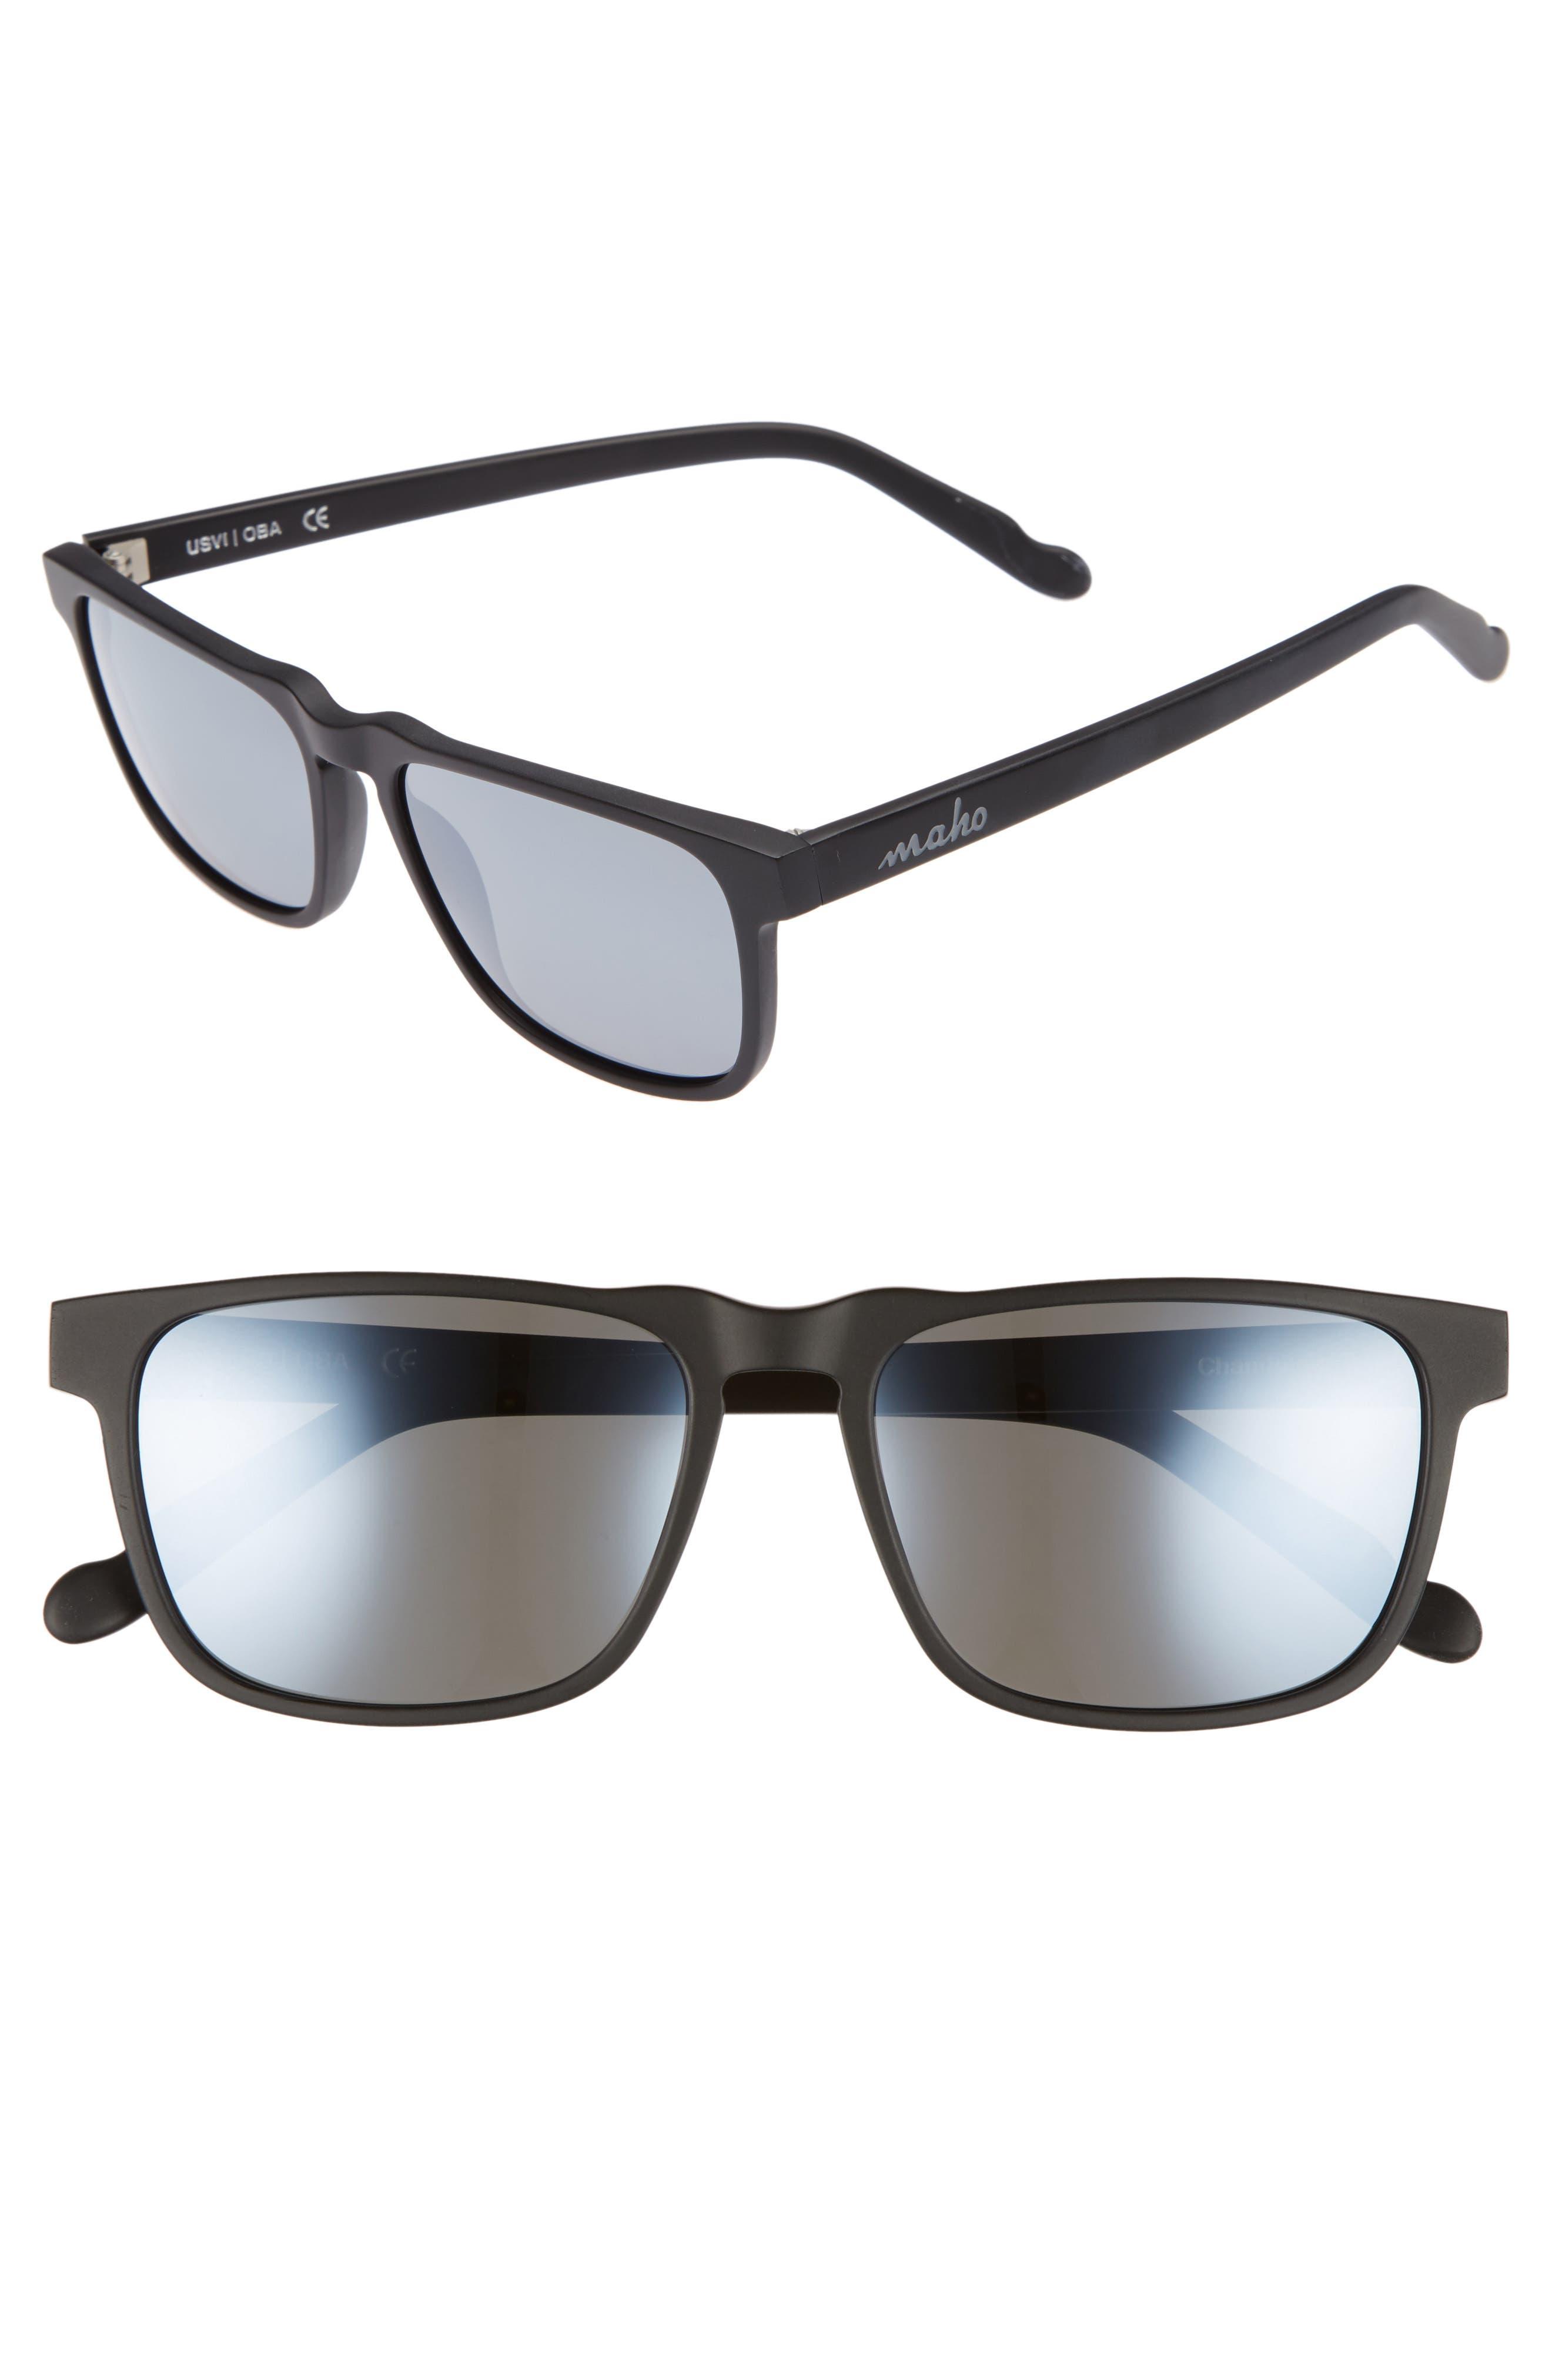 Chandeleur 59mm Polarized Aviator Sunglasses,                             Main thumbnail 1, color,                             020